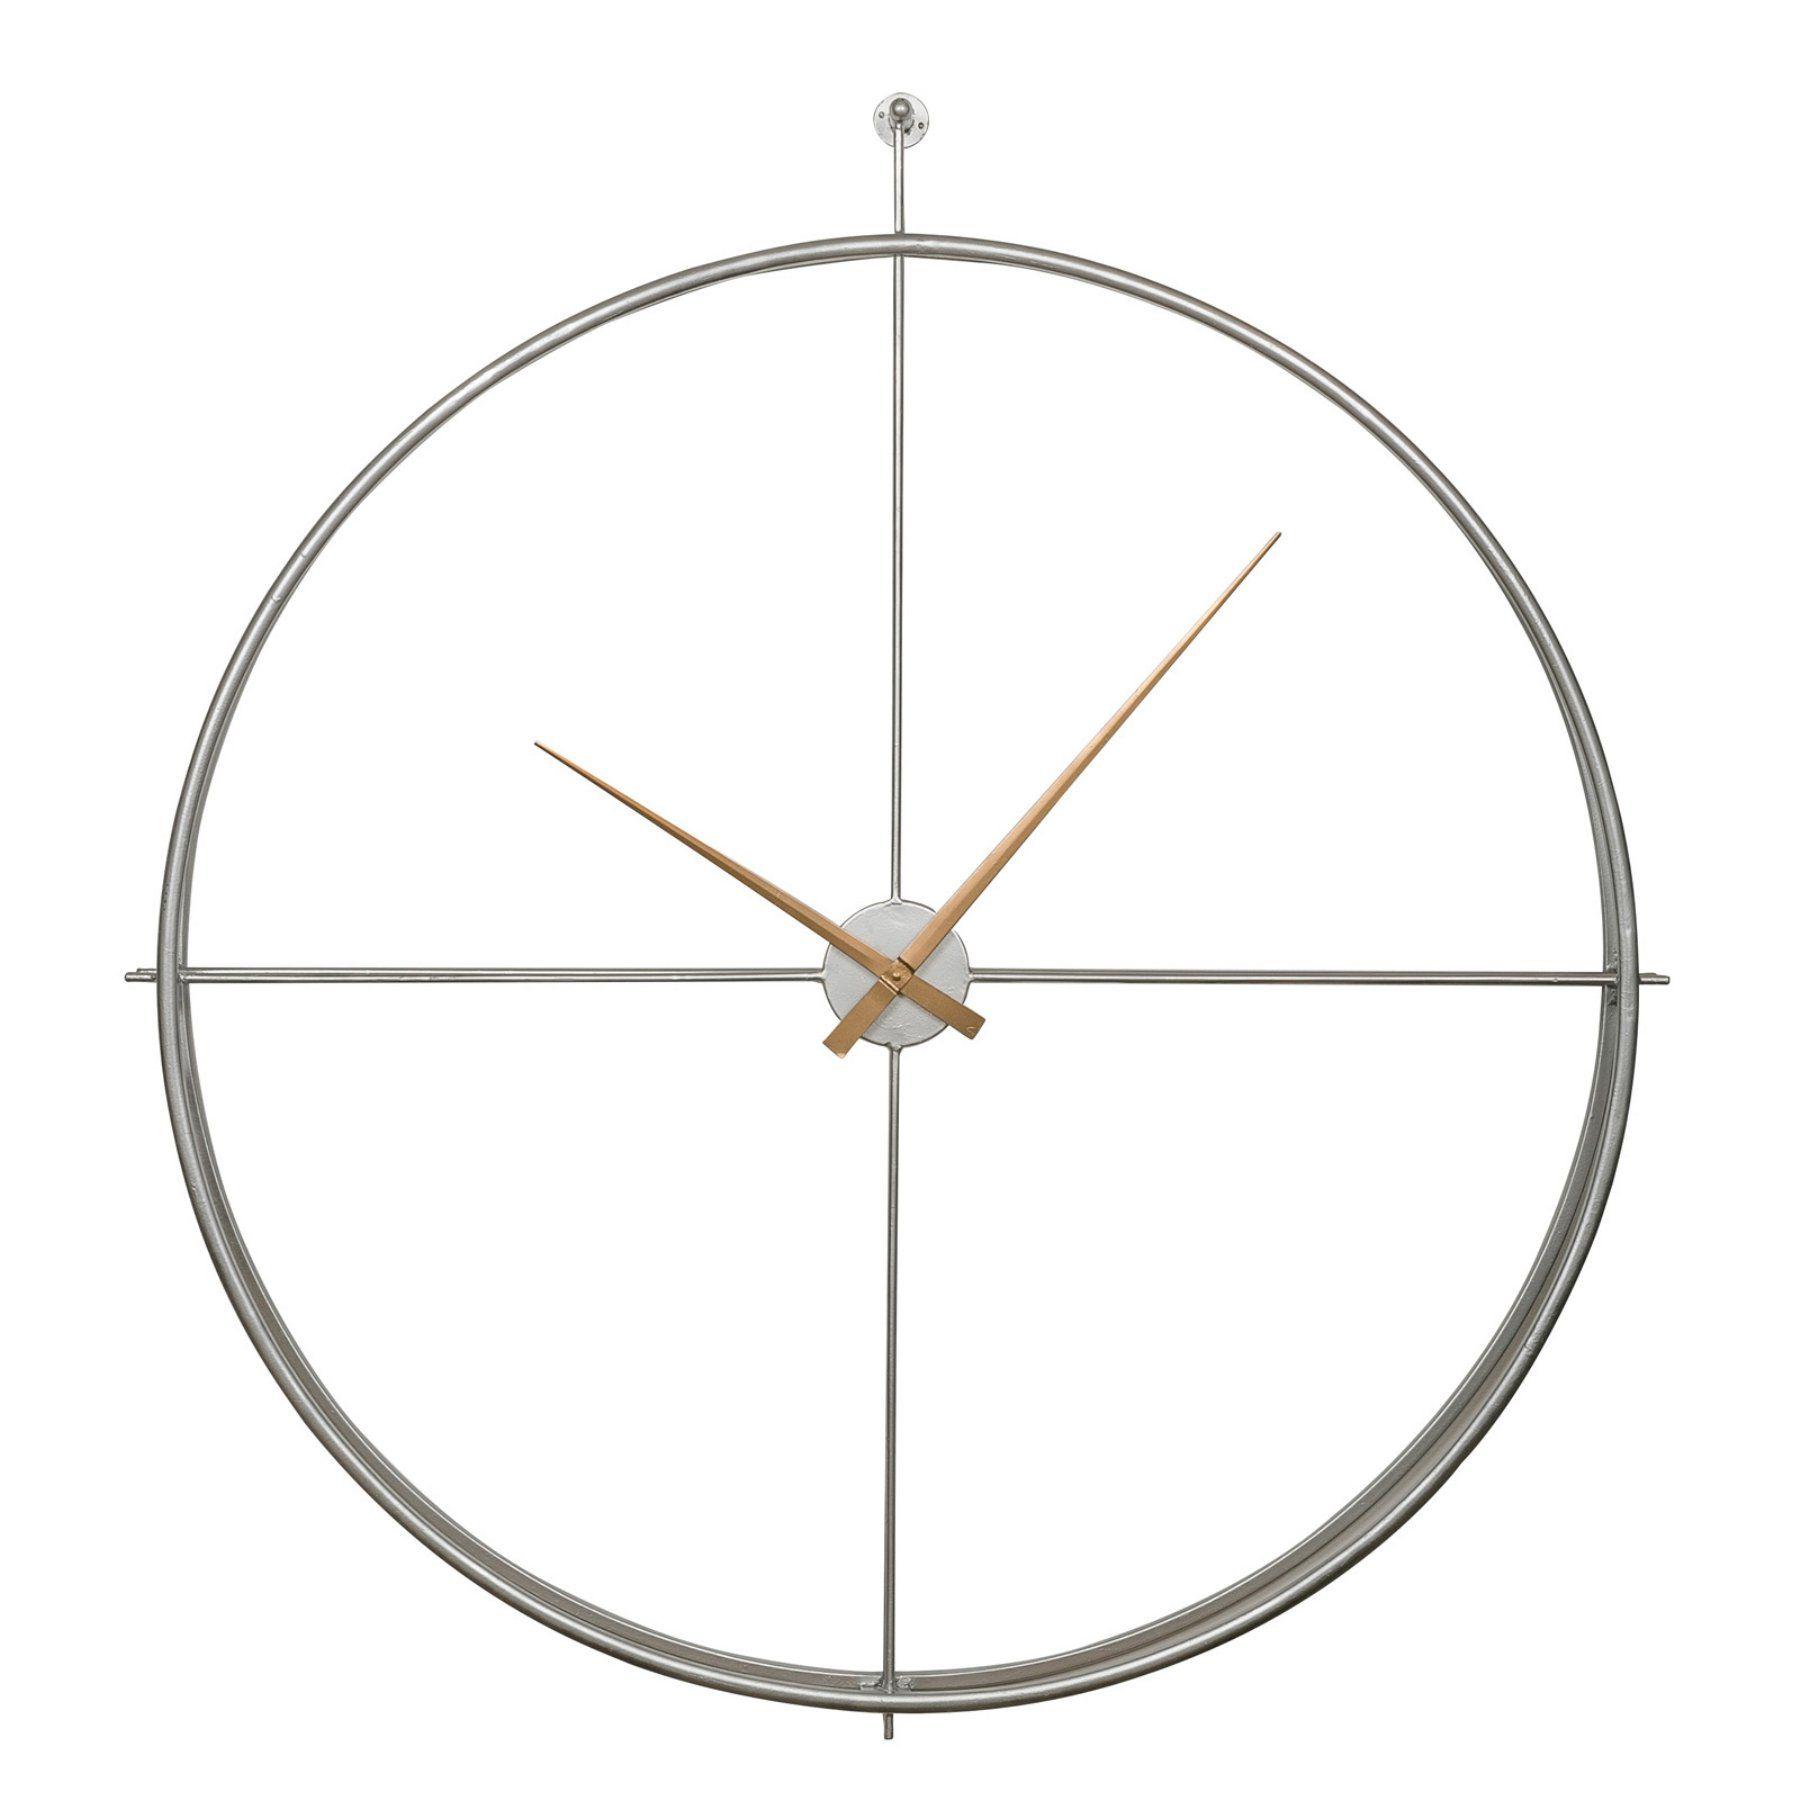 Cooper Classics Eden 47 In Wall Clock 41402 Clock Wall Clock Oversized Clocks